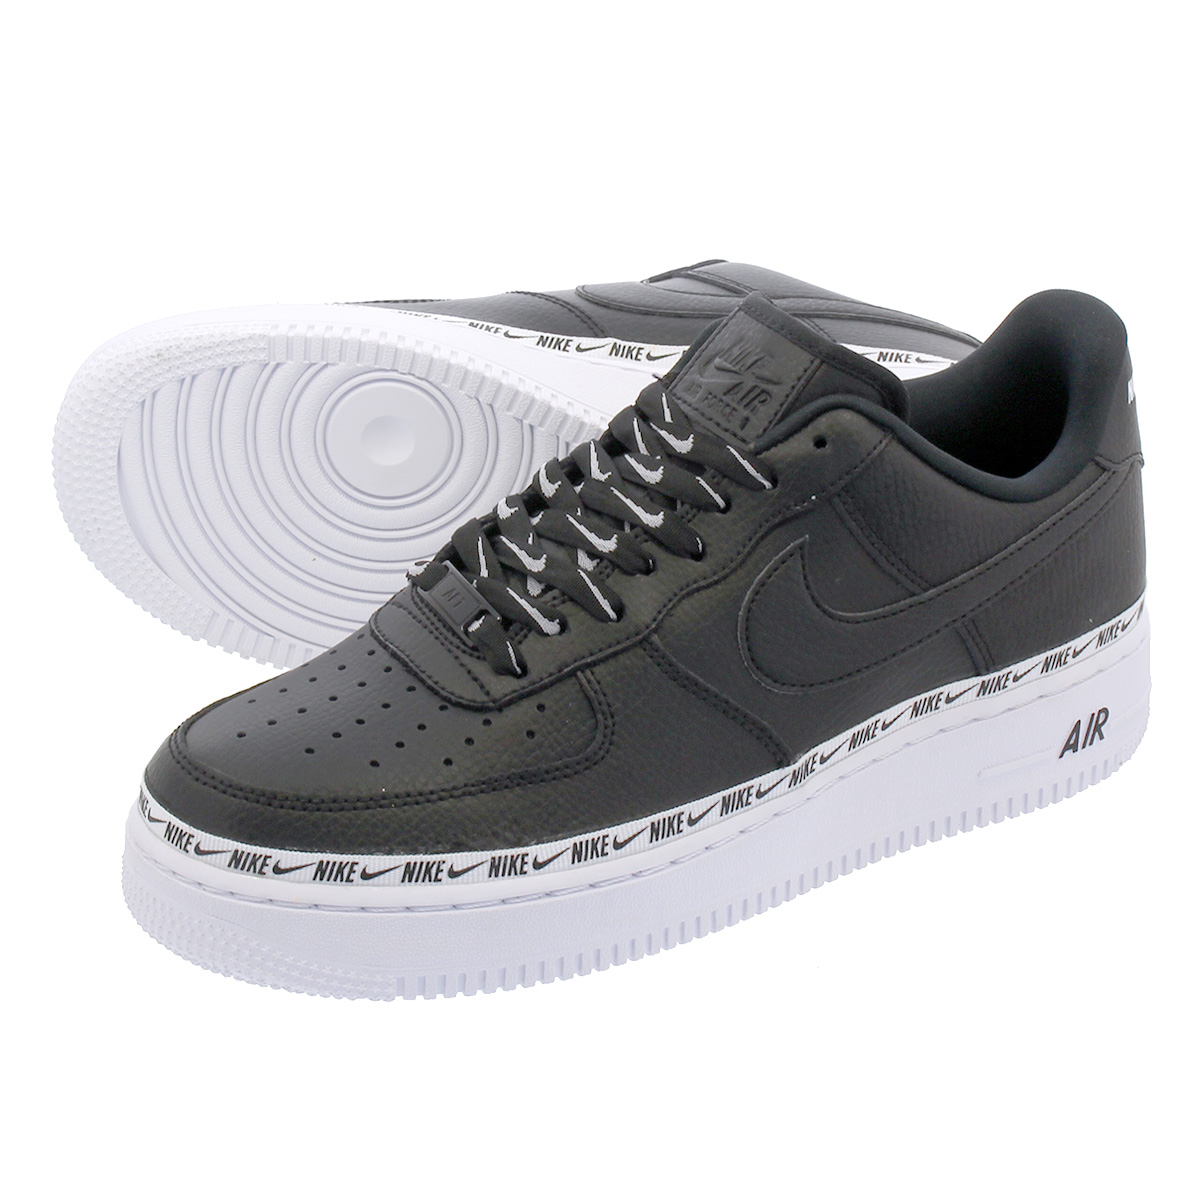 17cbb0b2df2a4a NIKE WMNS AIR FORCE 1  07 SE PRM Nike women air force 1  07 SE PRM BLACK  BLACK WHITE ah6827-002